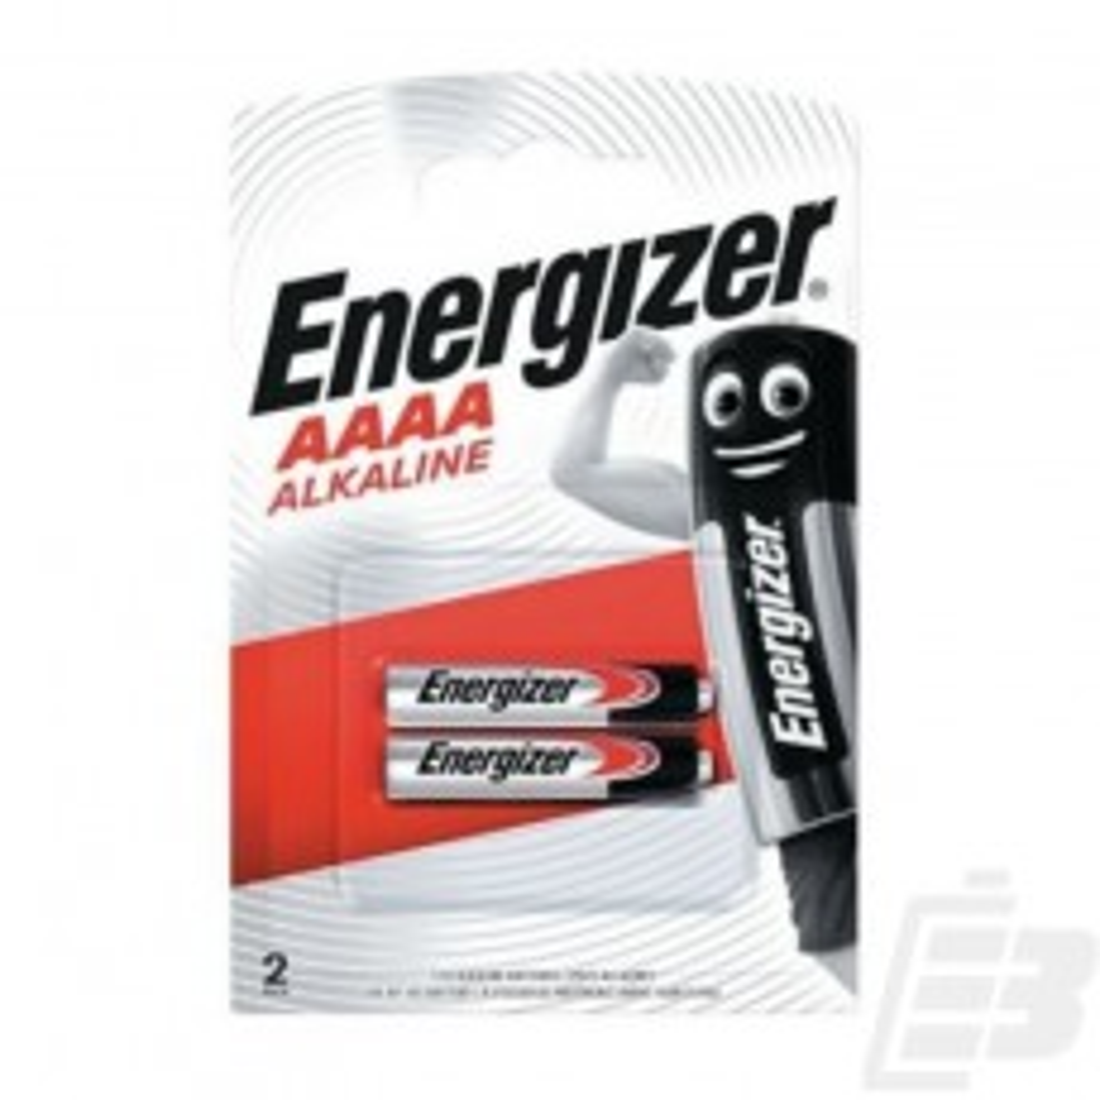 Energizer AΑΑΑ Alkaline Battery